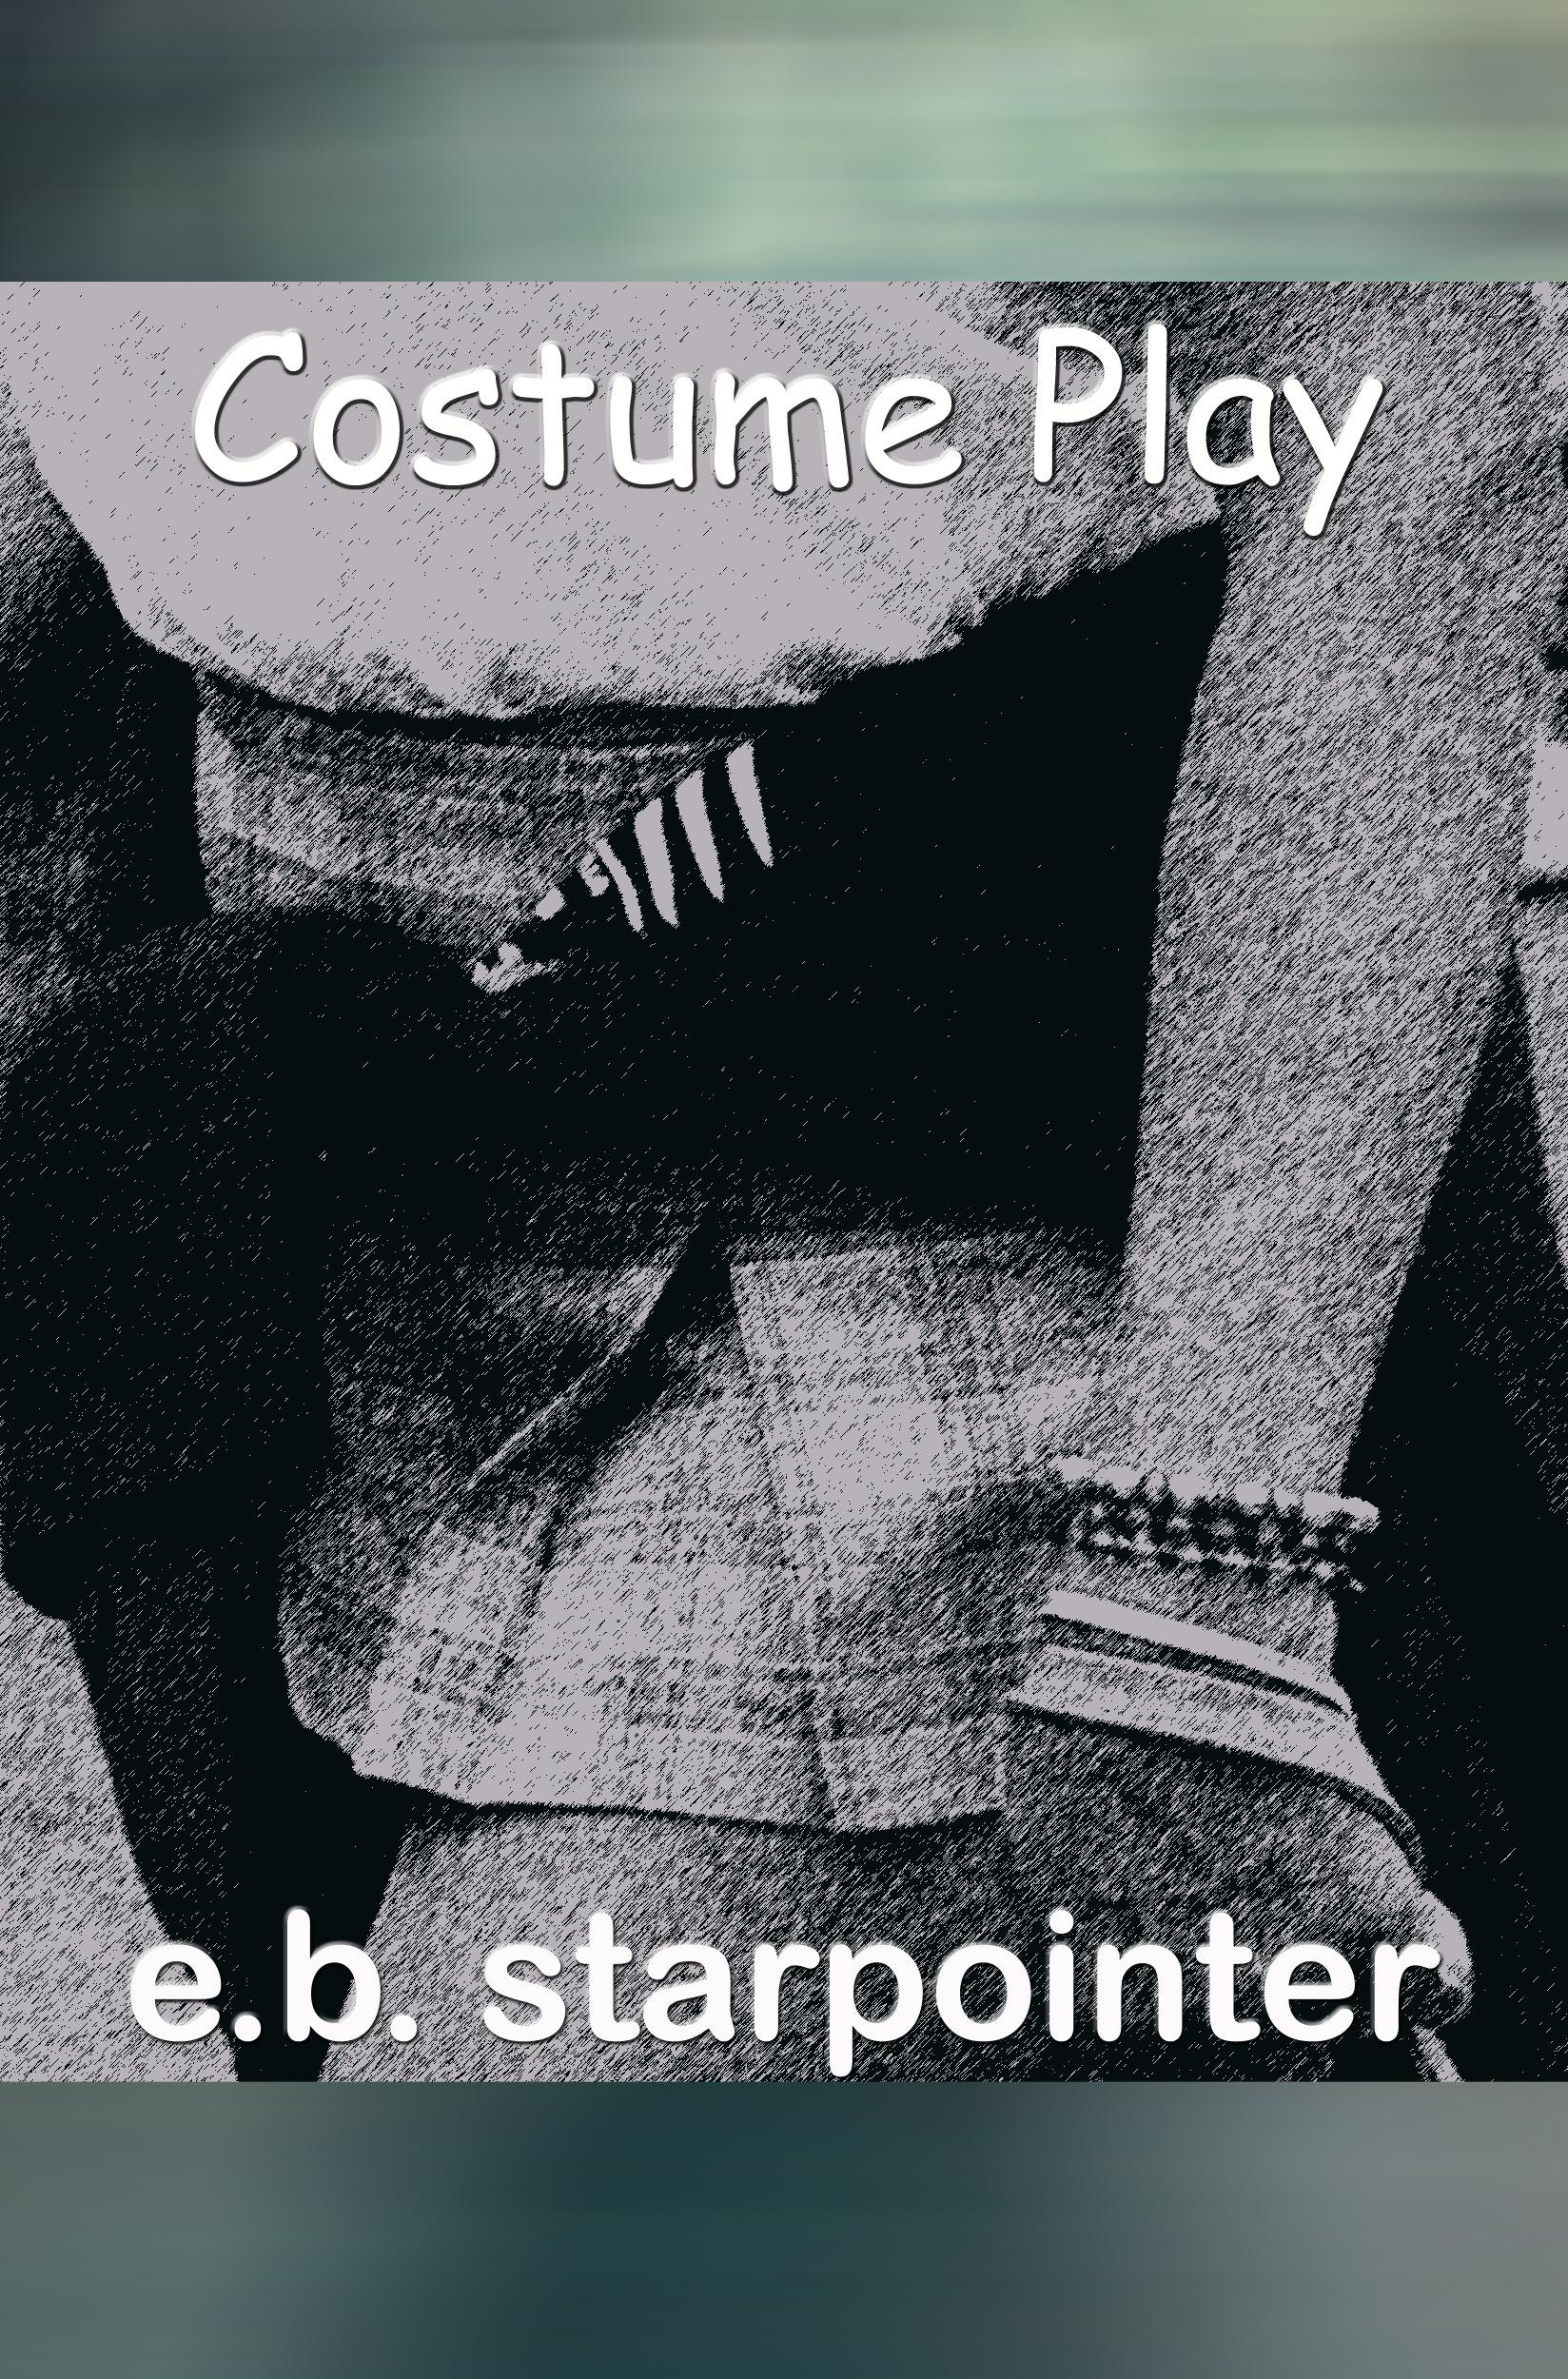 Costume Play